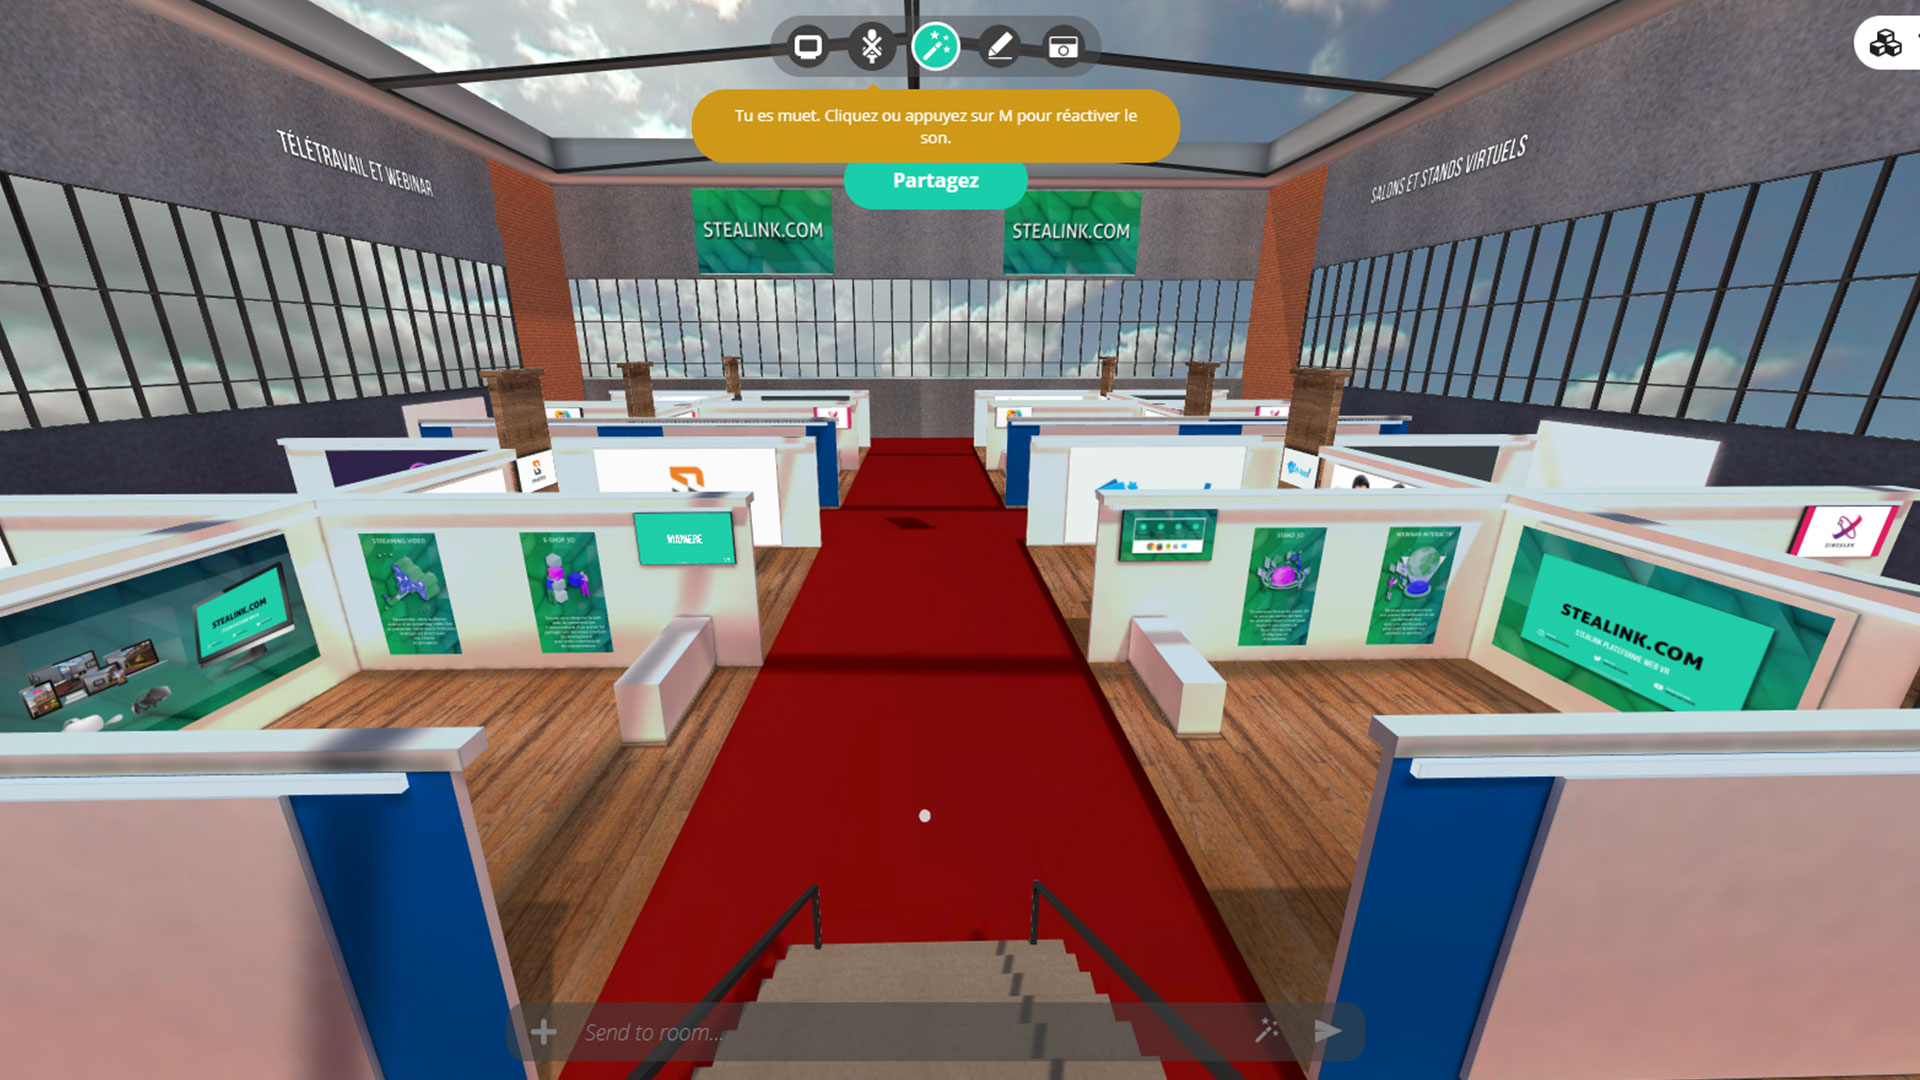 STEALINK.COM full-exhibtion Salon virtuel de l'orientation